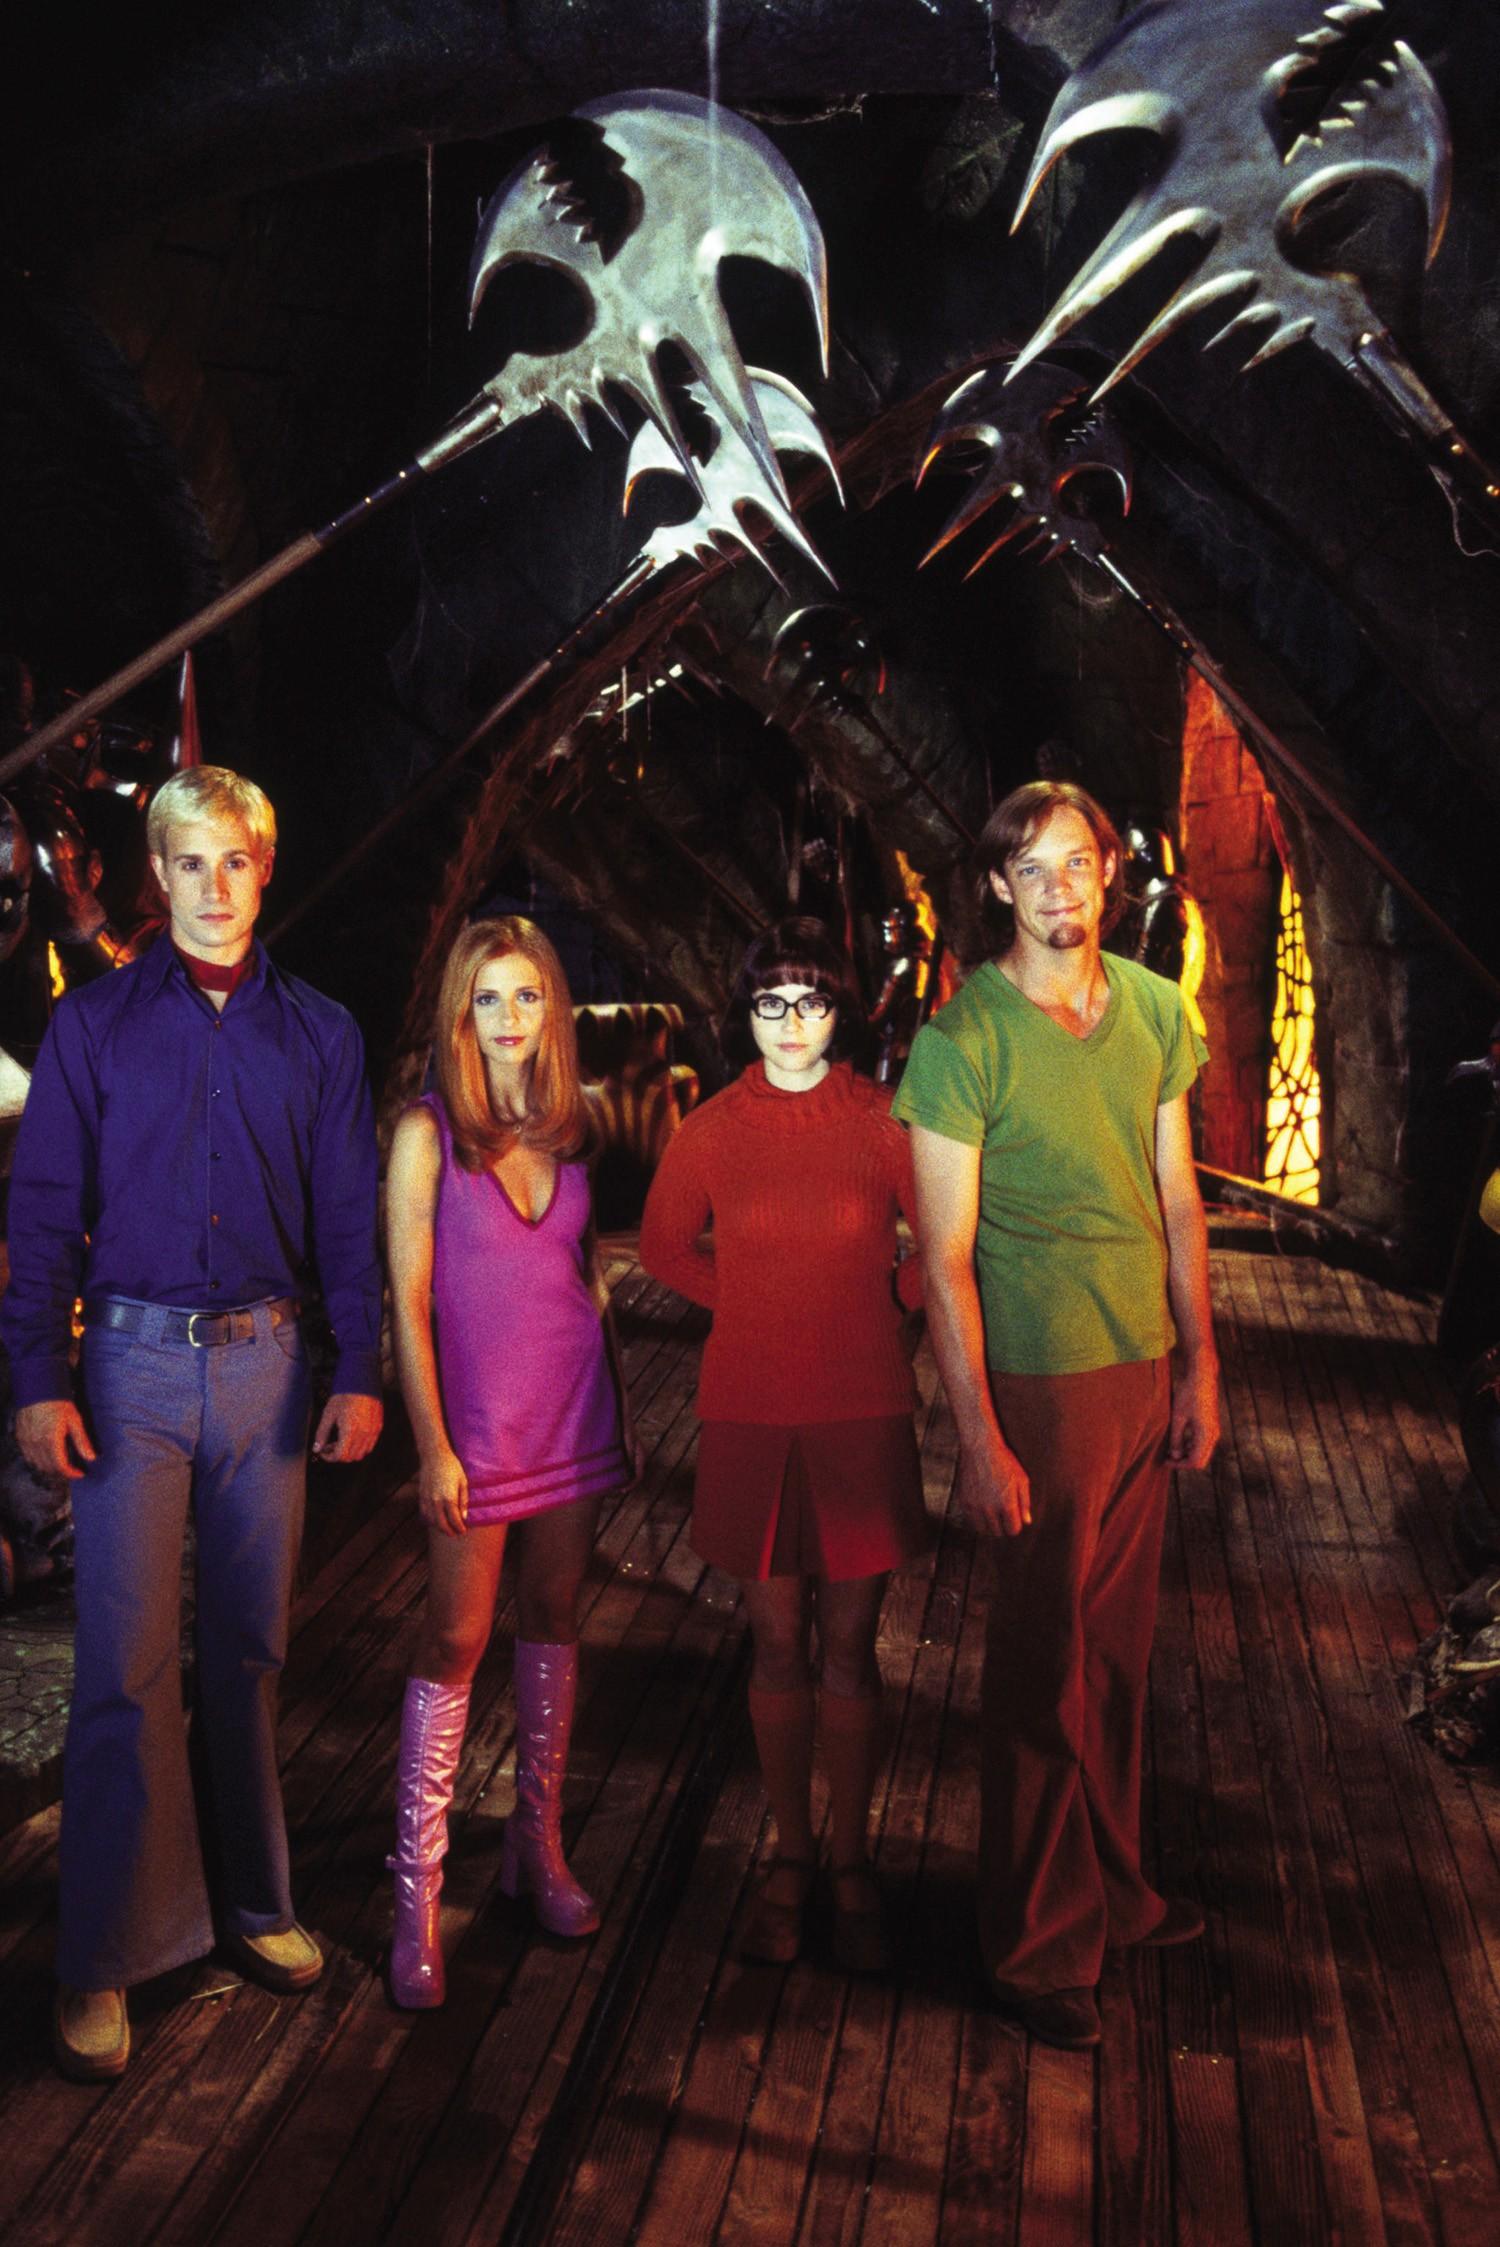 Freddie Prinze Jr.,Linda Cardellini,Matthew Lillard,Sarah Michelle Gellar